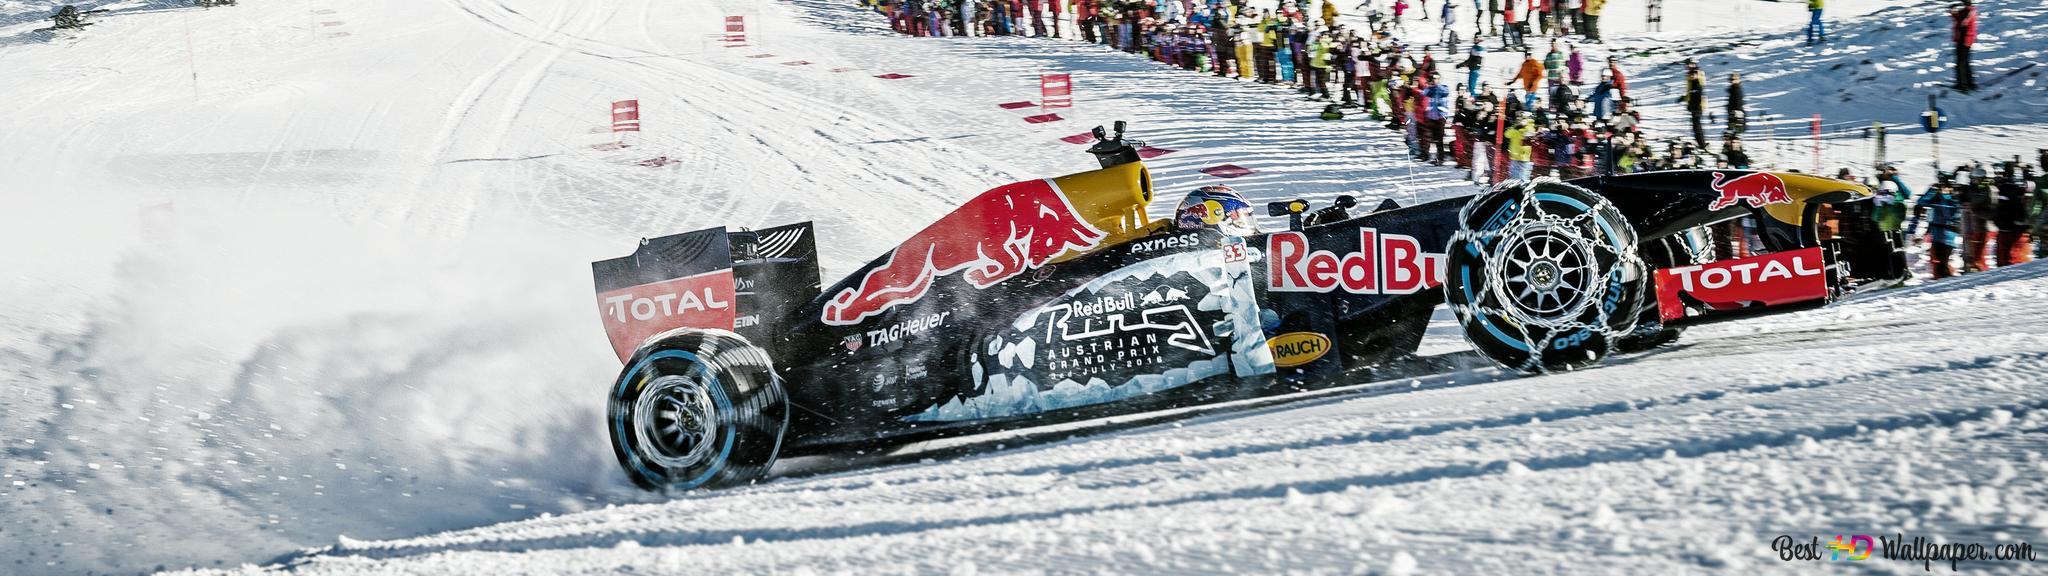 red-bull-racing-f1-sfondo-2048x576-52953